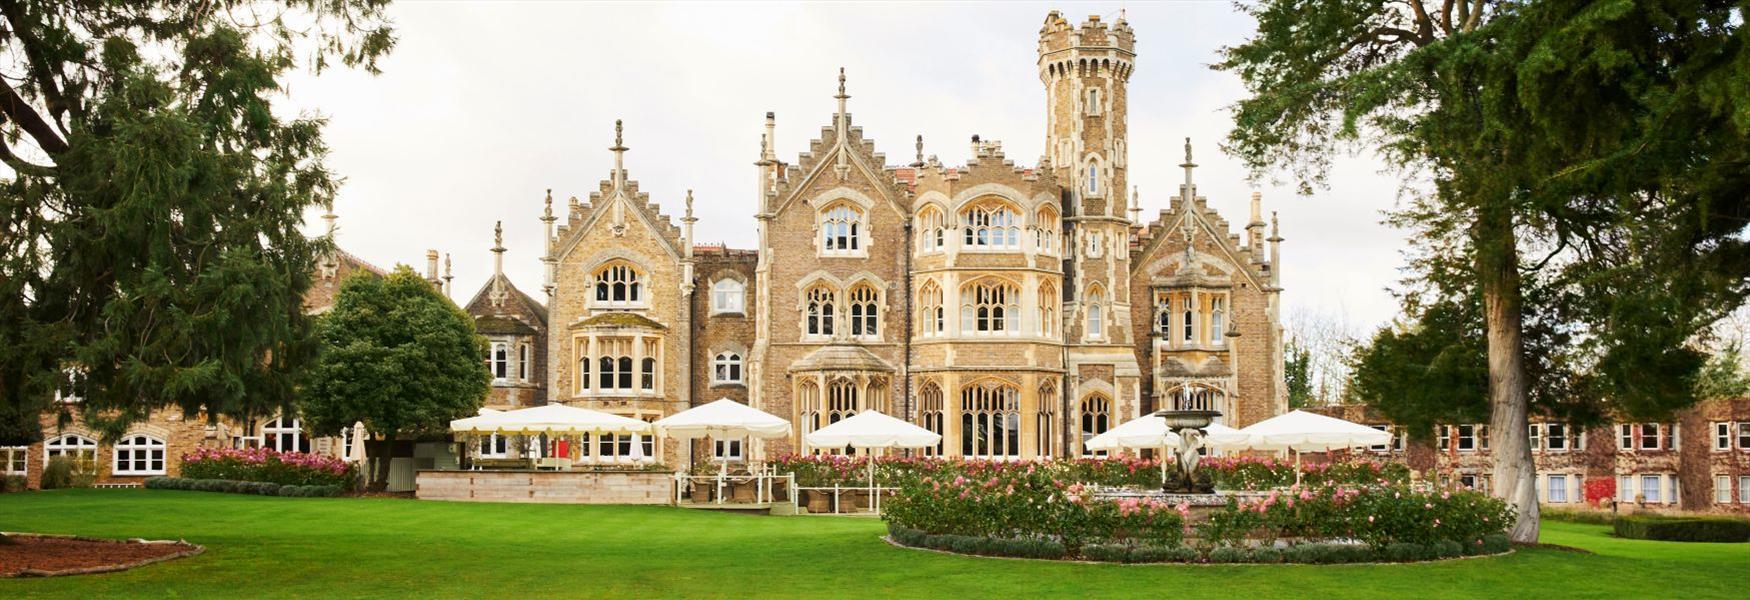 Exterior of Oakley Court, a riverside hotel in Windsor